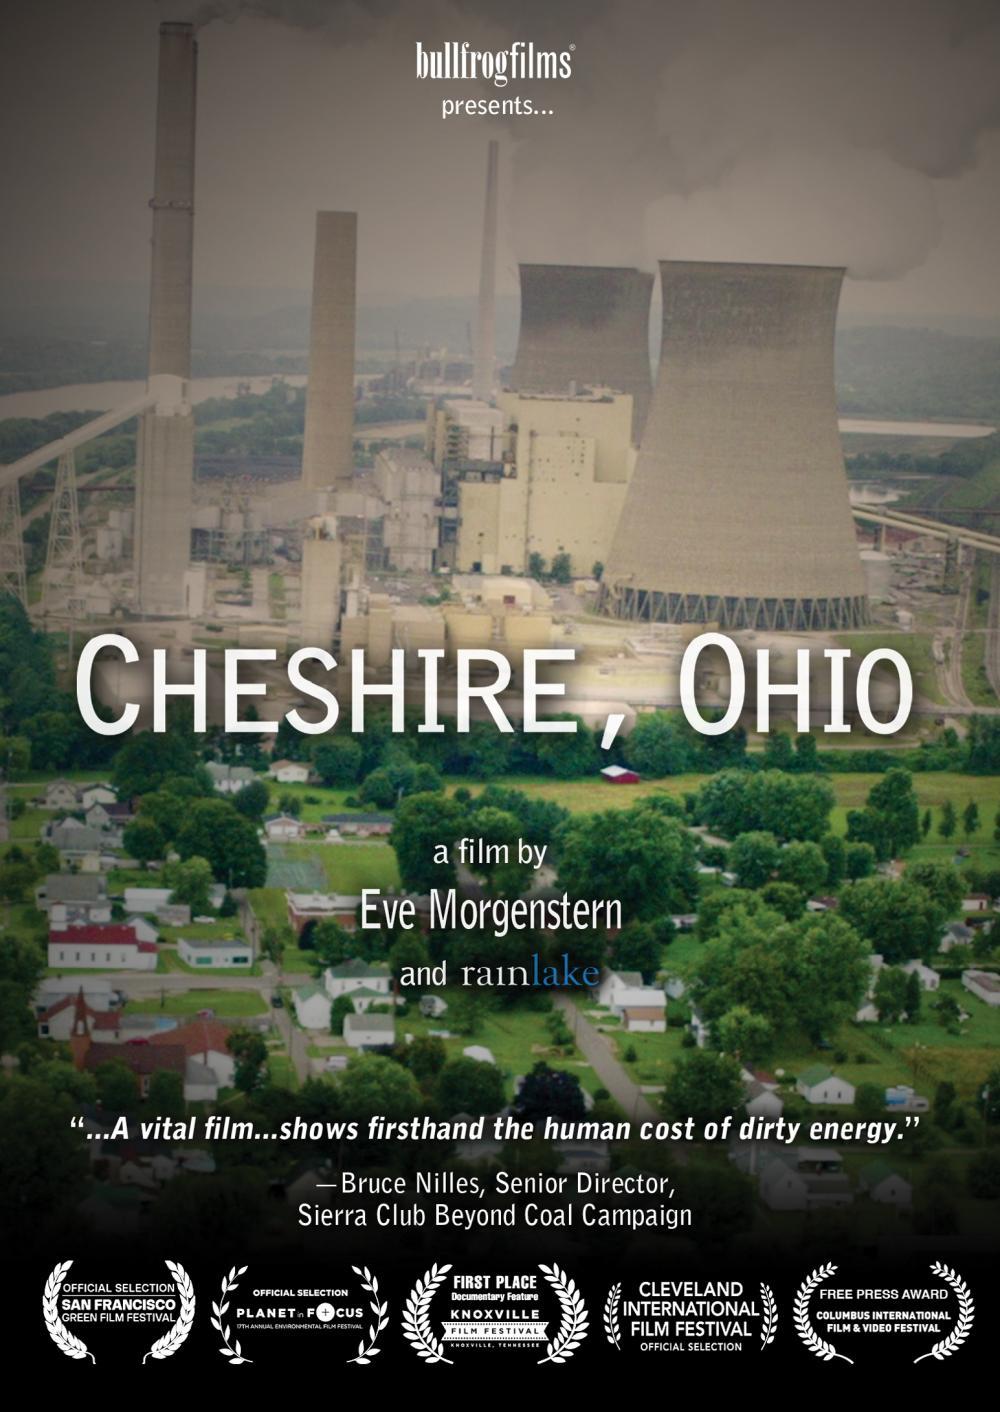 cheshire-ohio-american-coal-story-3-acts